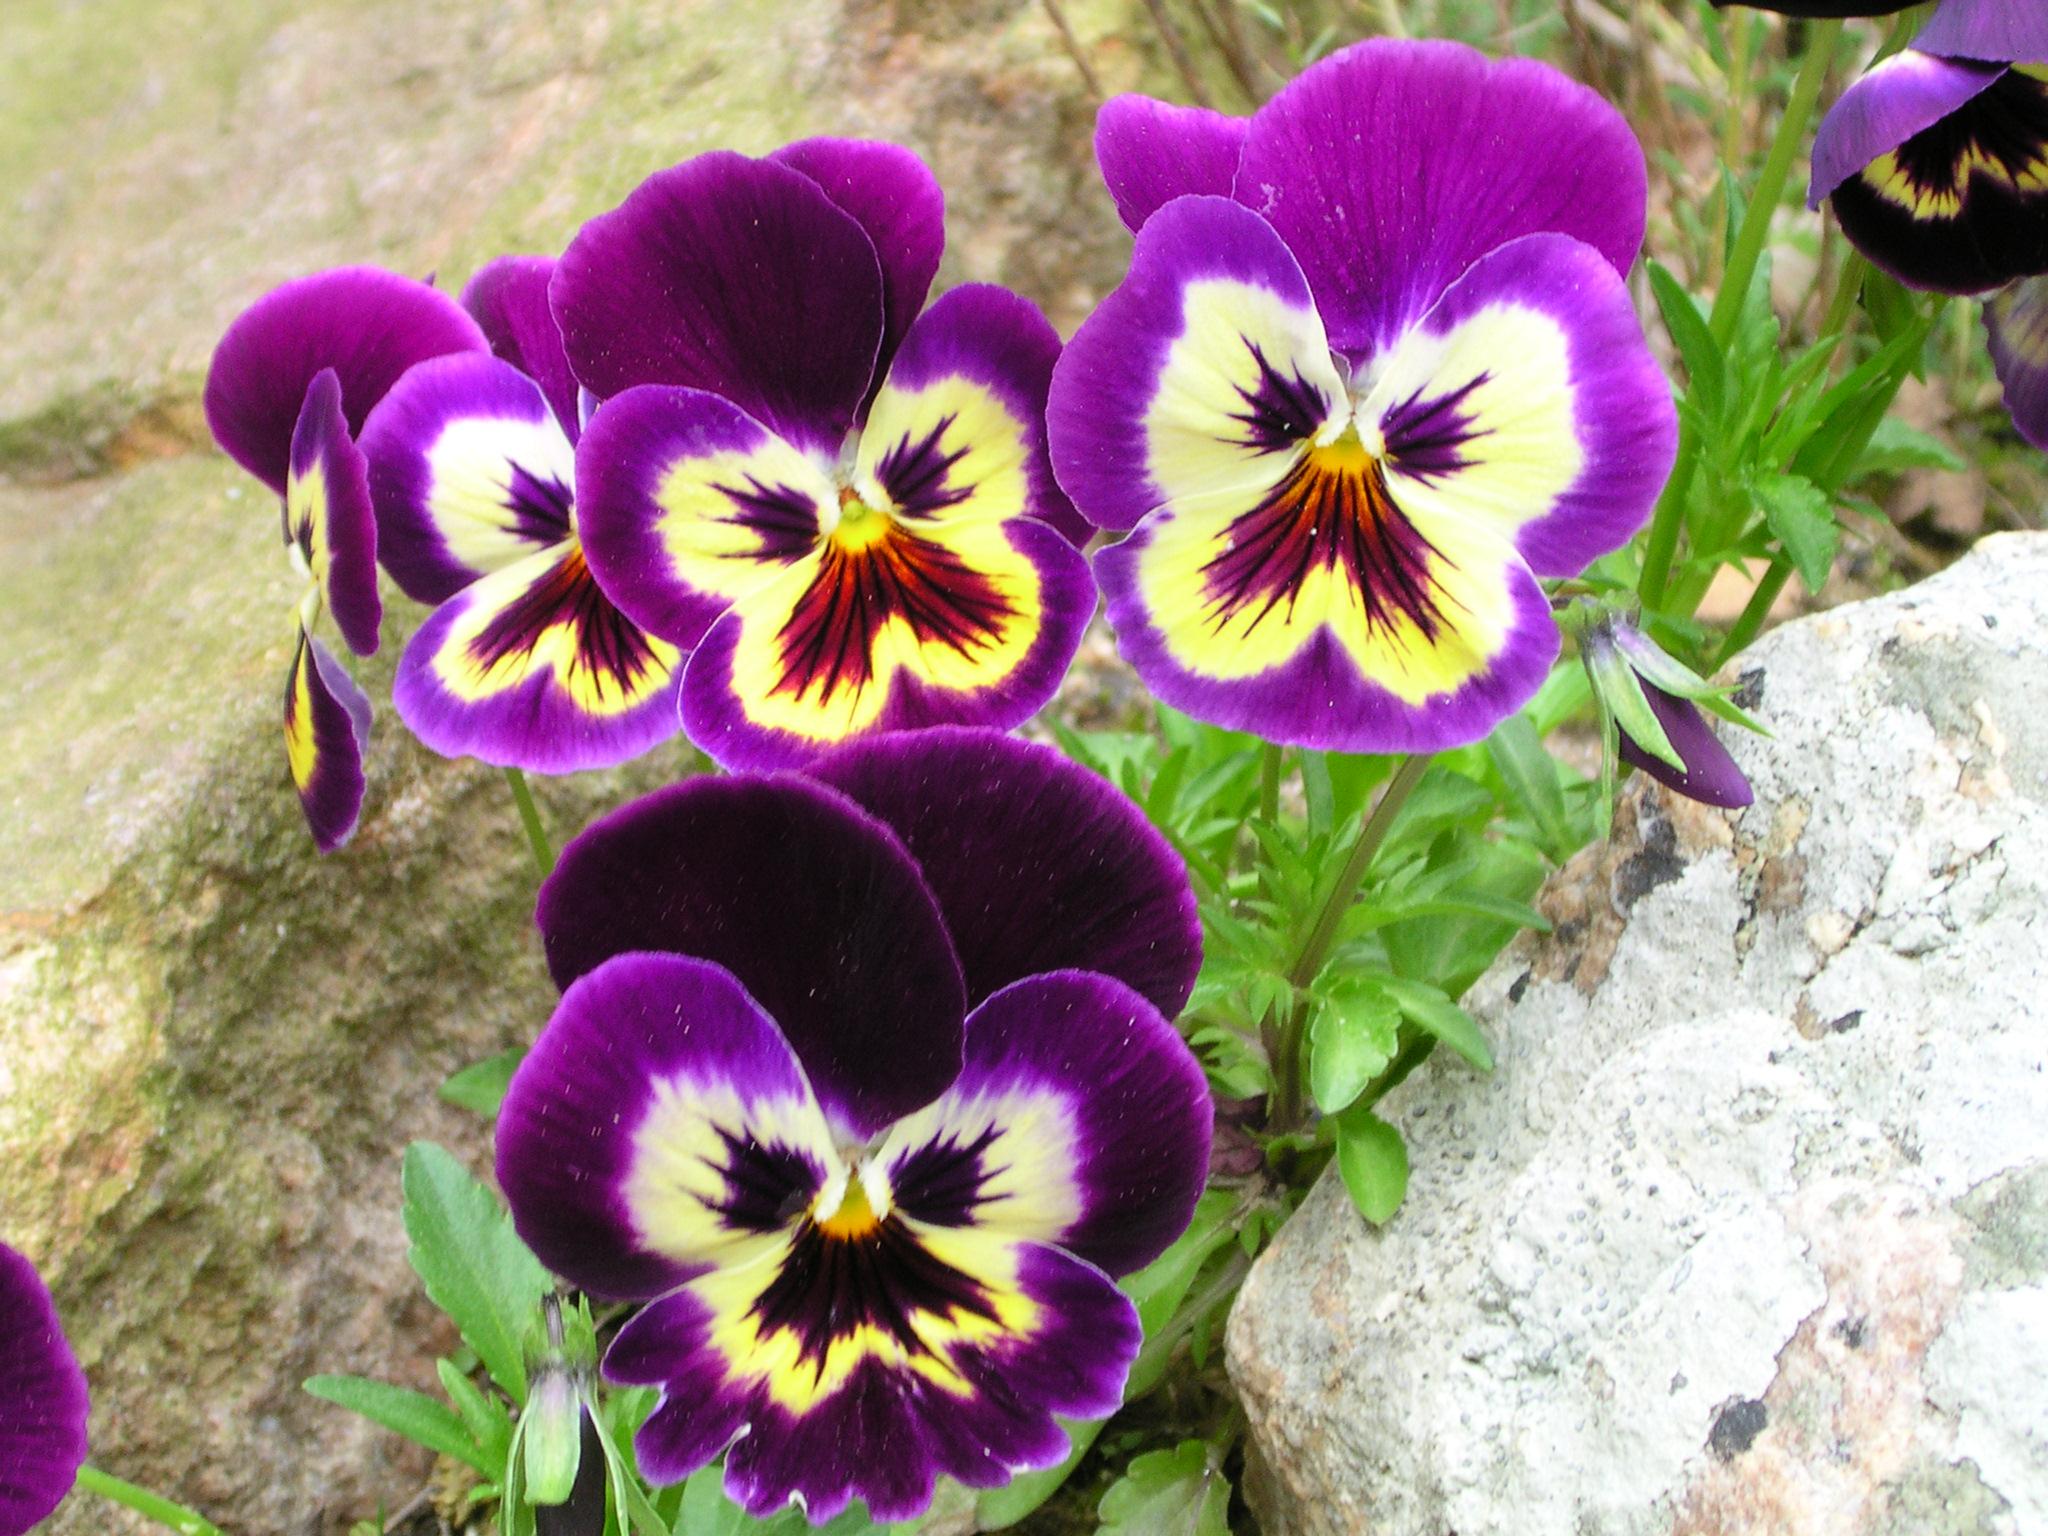 Closeup image of purple pansy flowers